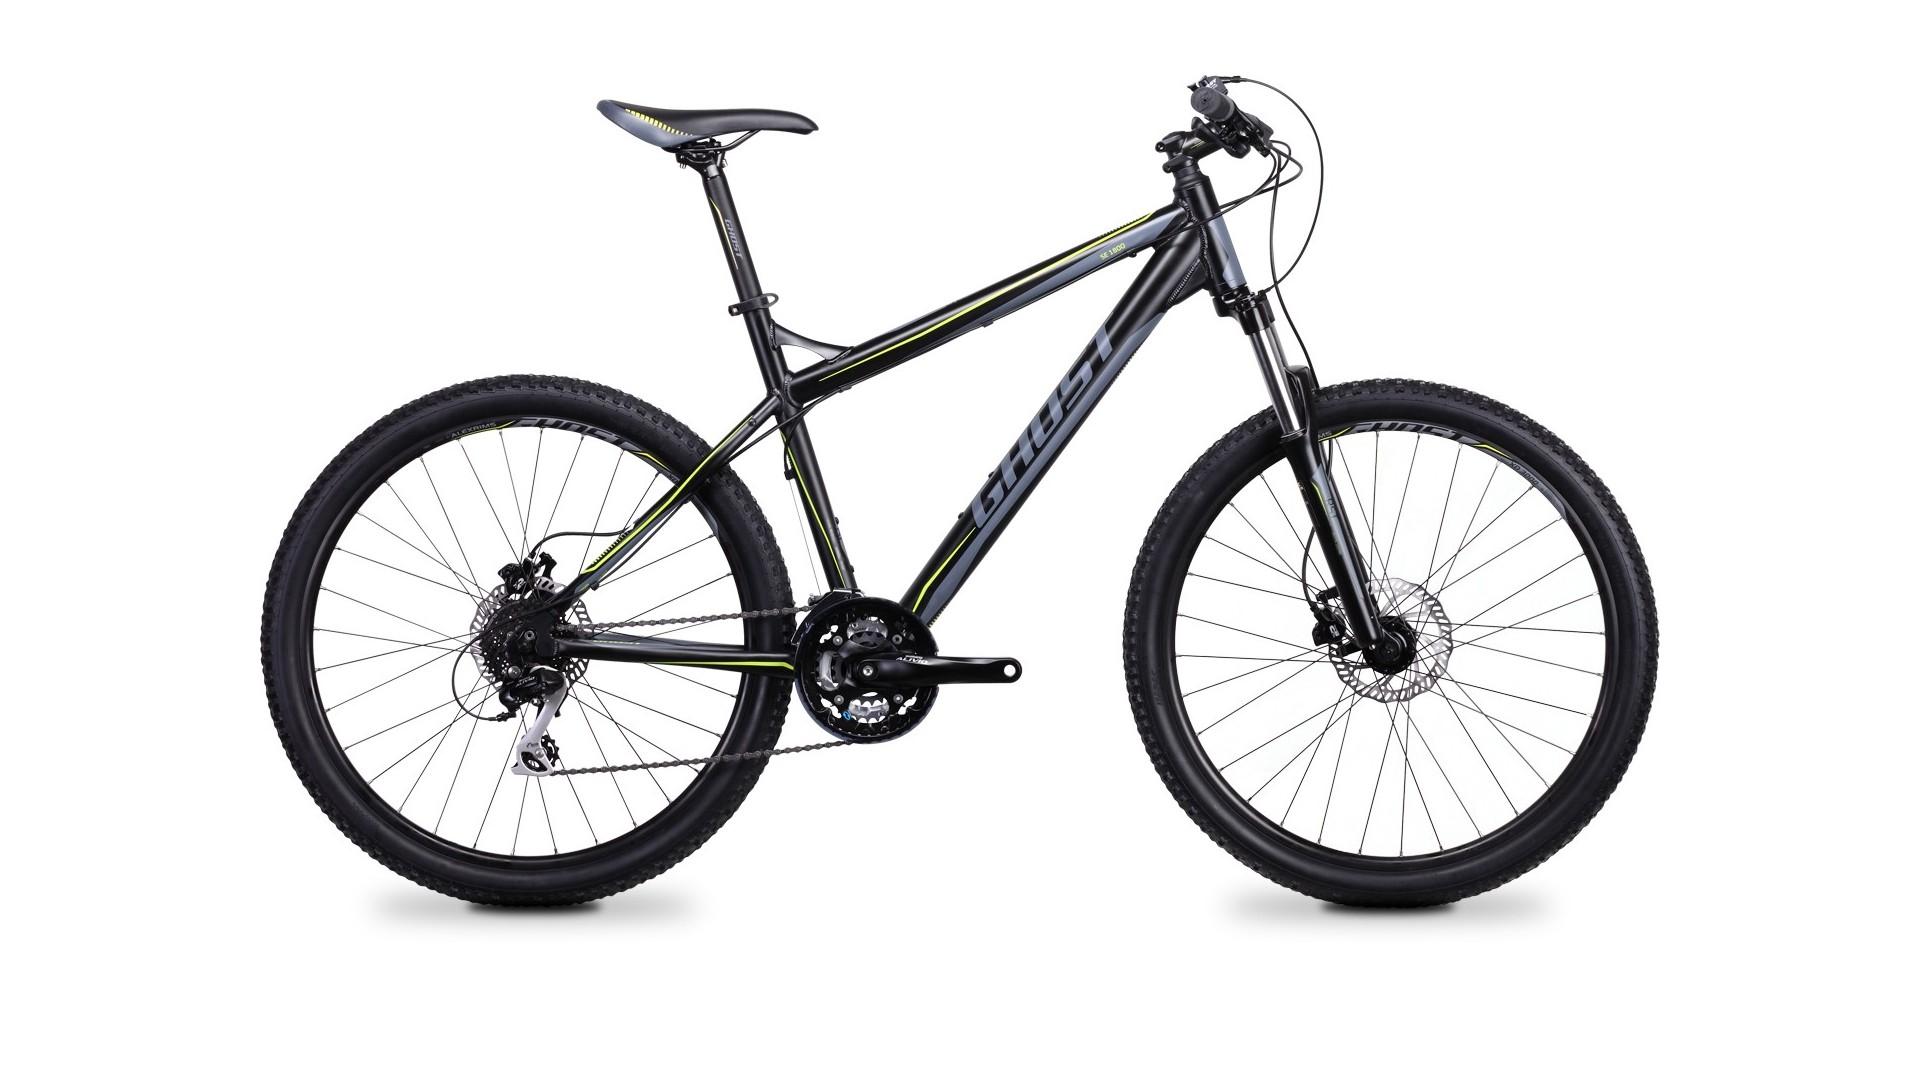 Велосипед GHOST SE 1800 black/grey/green год 2014